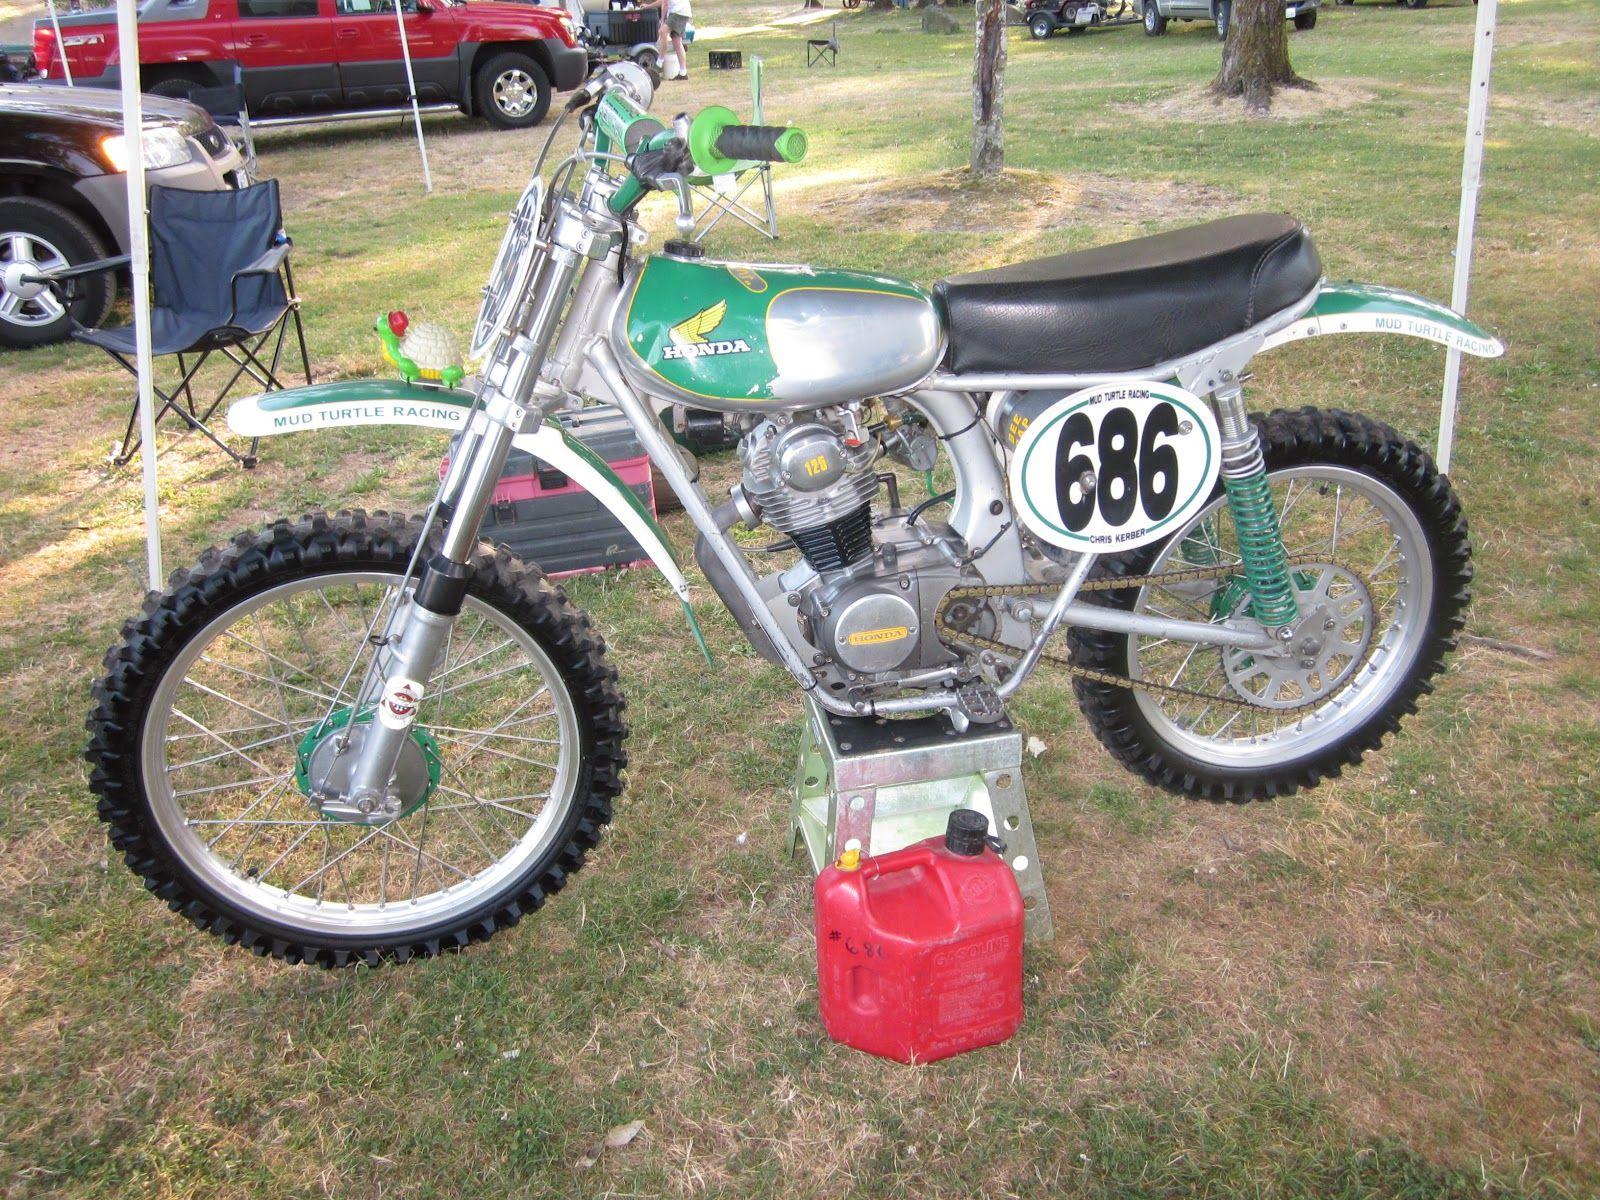 Cb100ss Small Capacity Vintage Japanese Motorcycle Enthusiasts Motocross Bikes Honda Bikes Motorcycle Dirt Bike